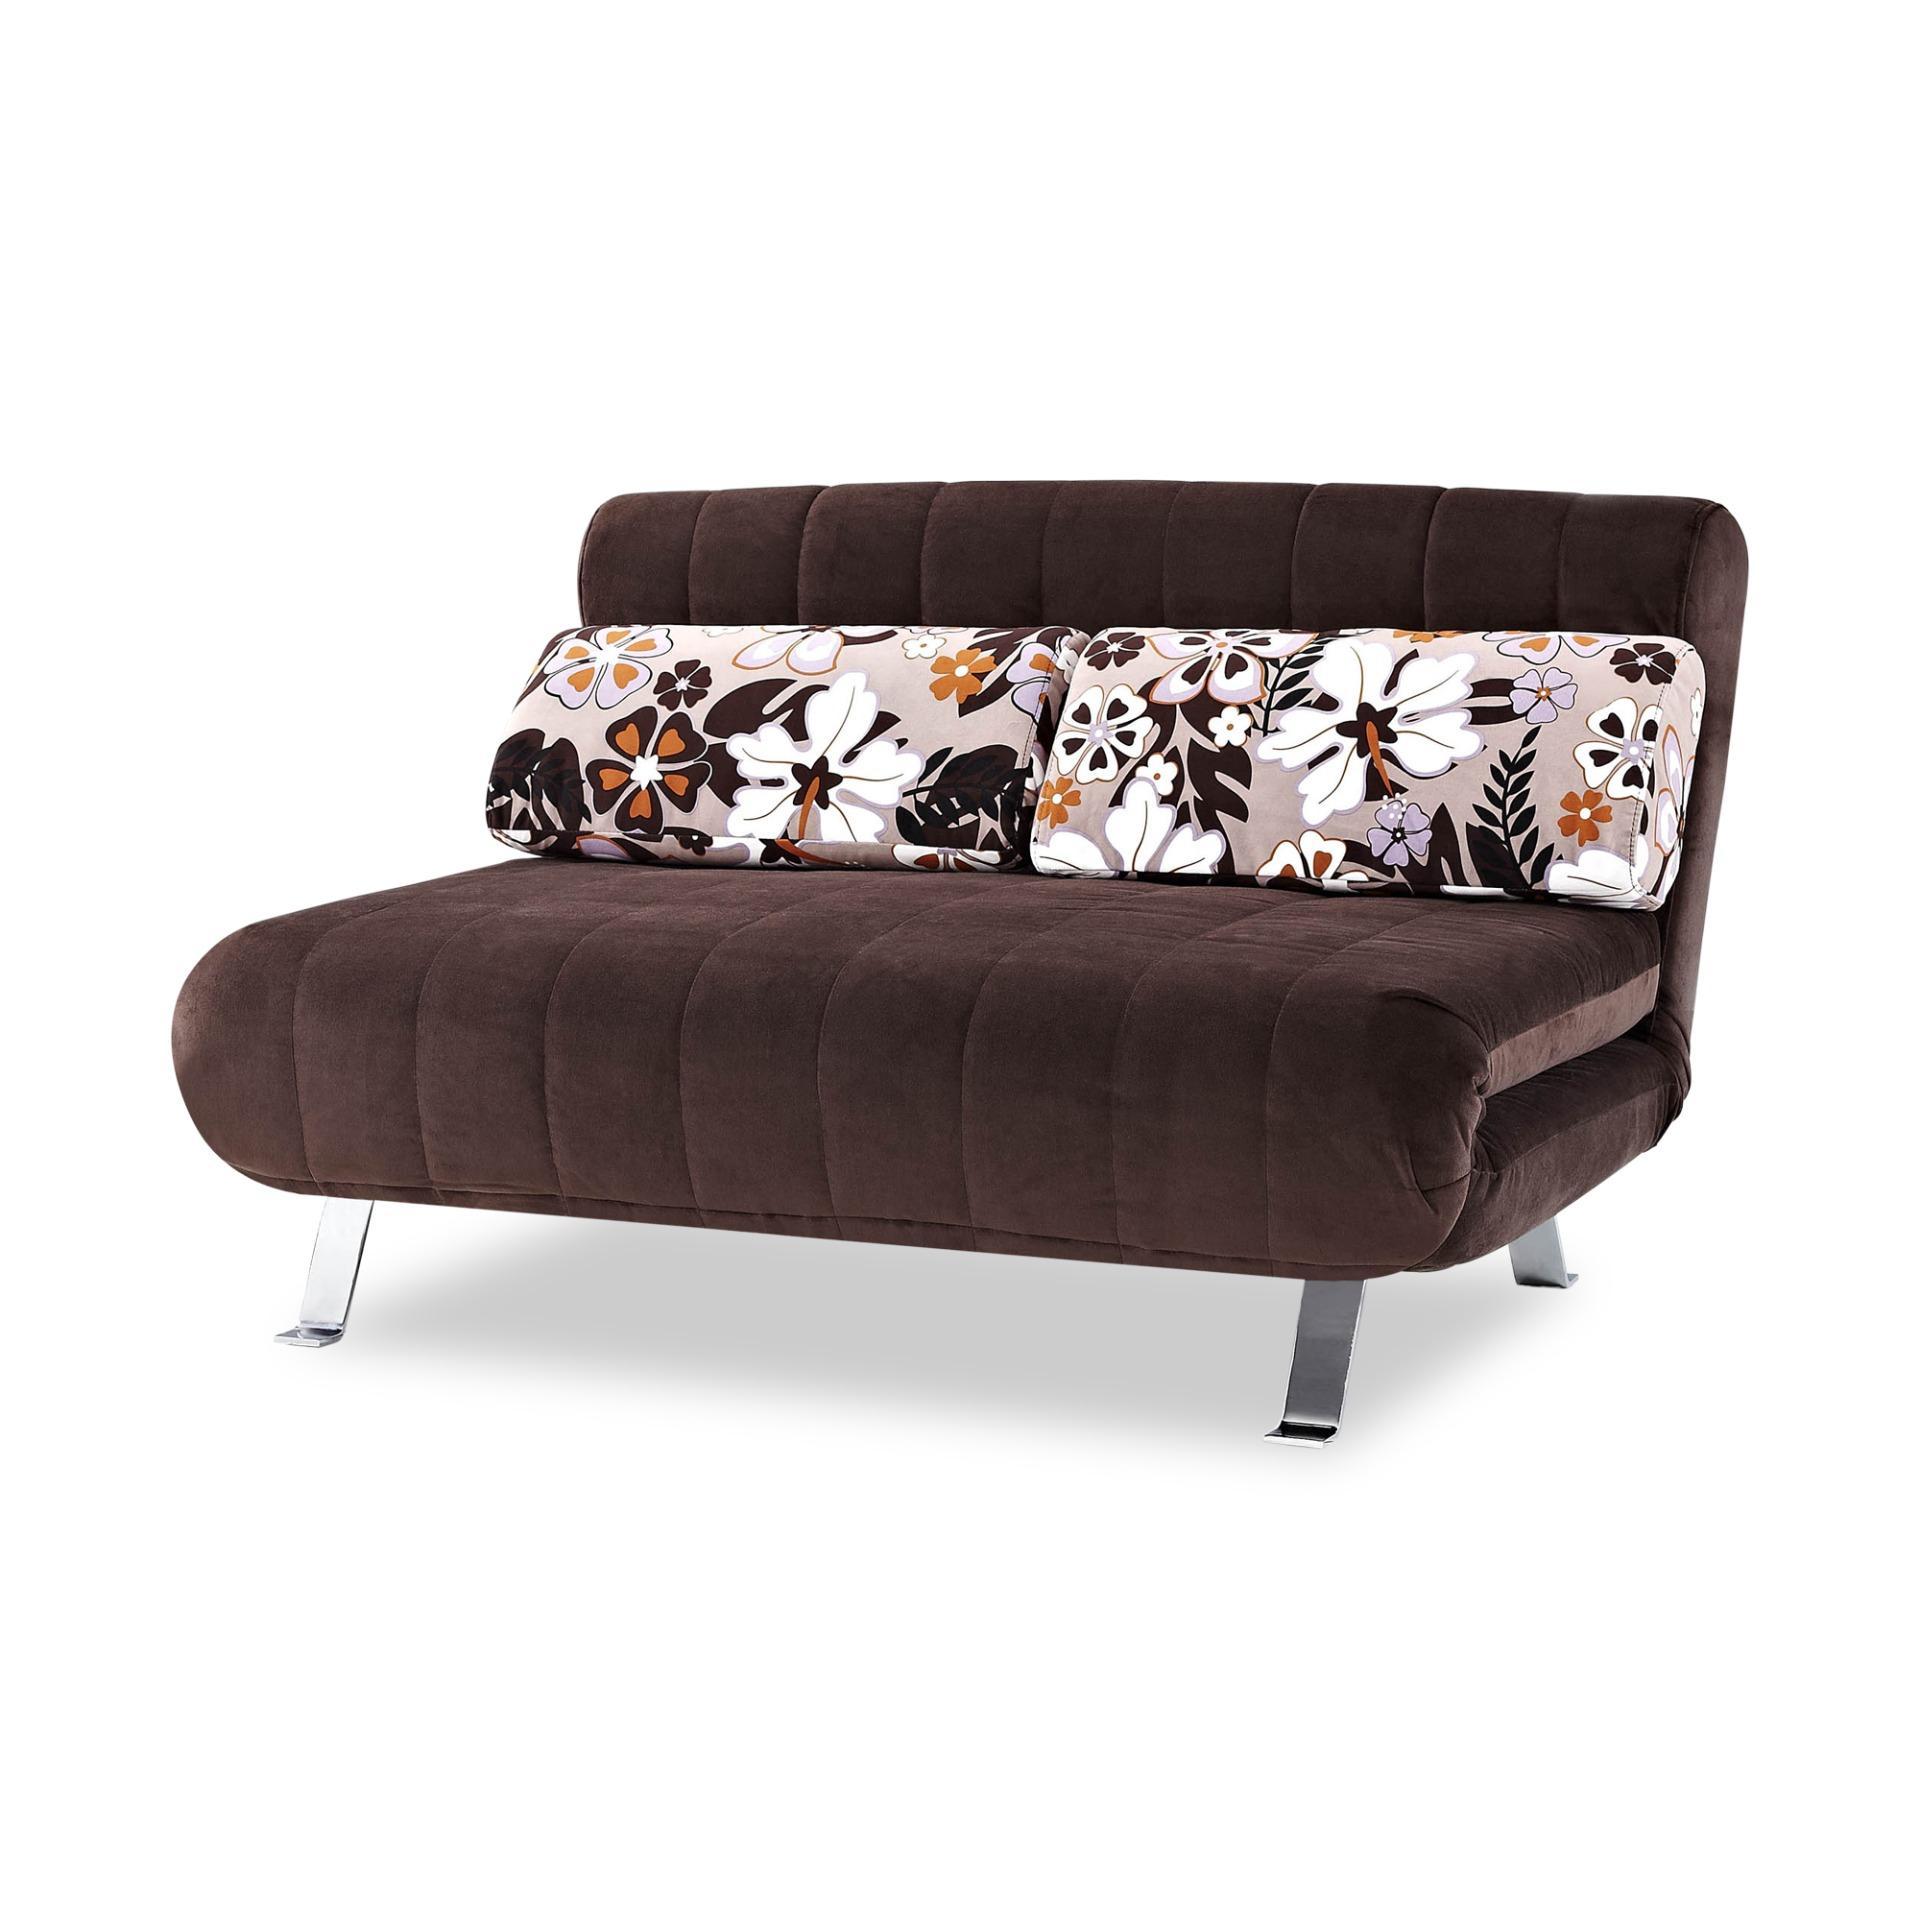 futons sleep decor of faux home multiple futon idea leather colors adjustable to sofa best fresh comfortable bycast walmart on